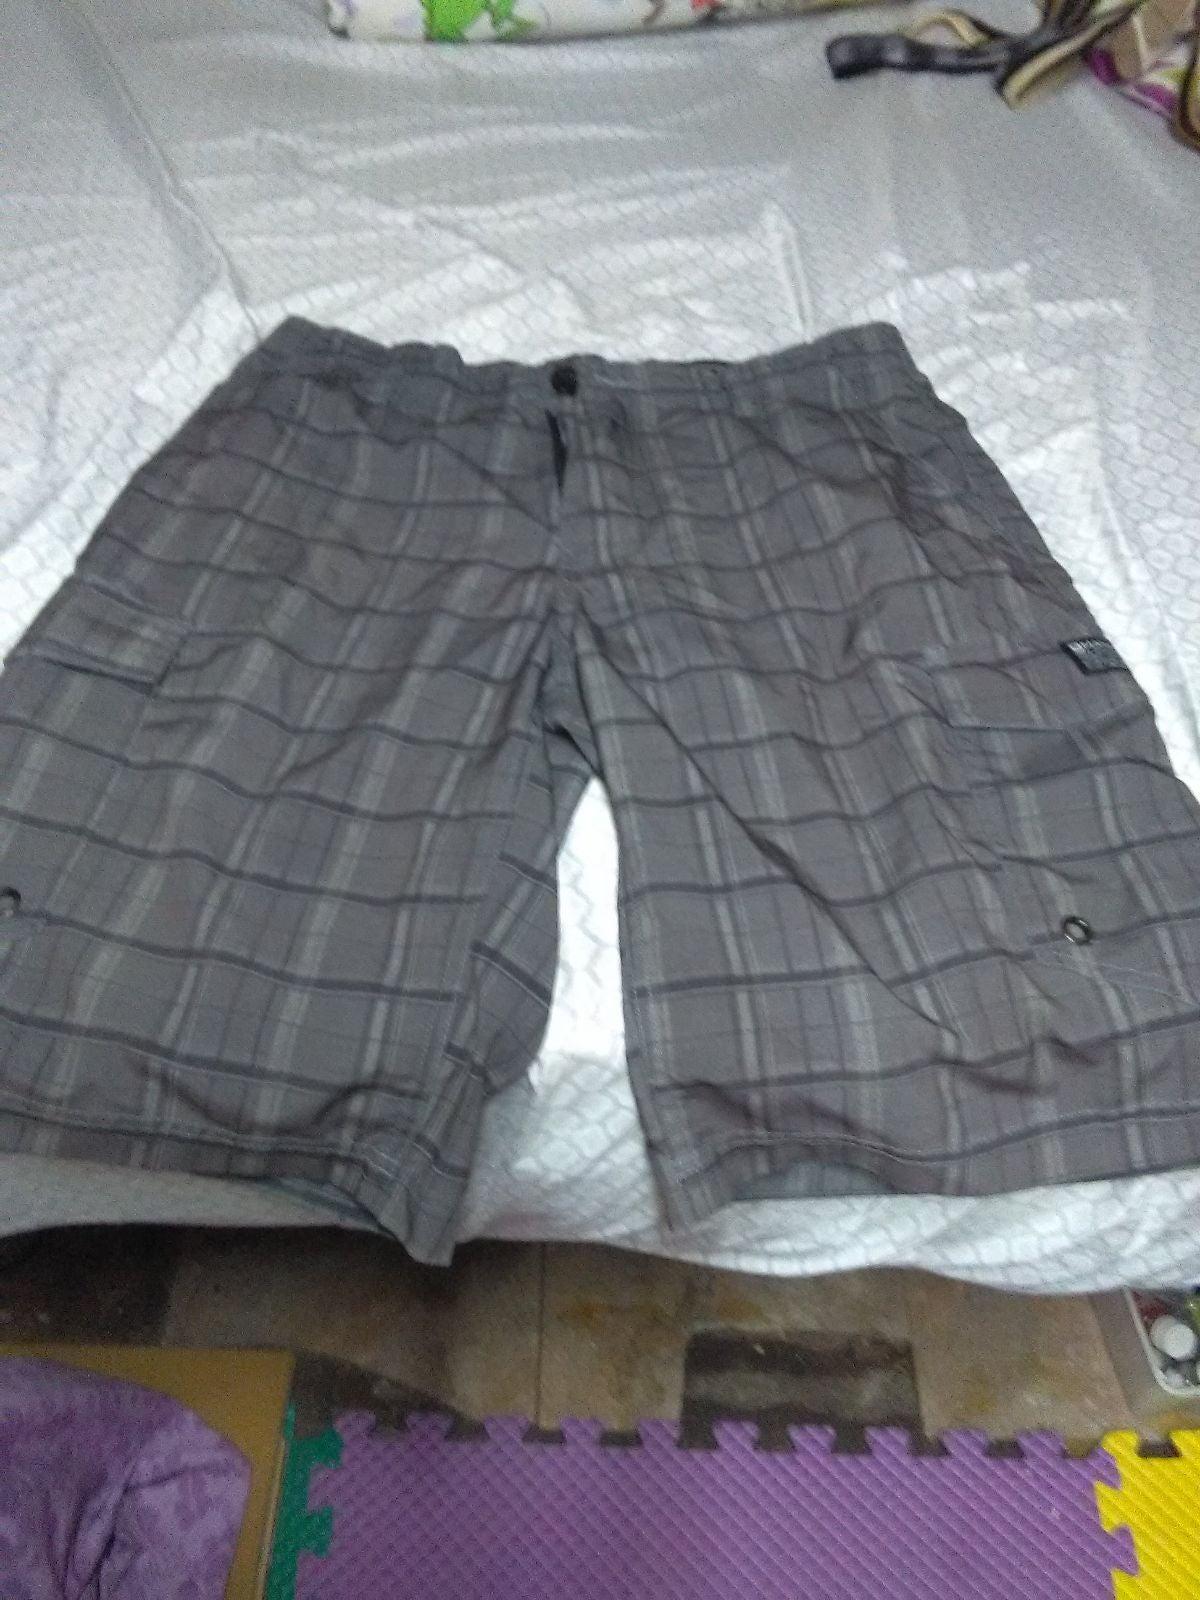 Shorts men's size 32